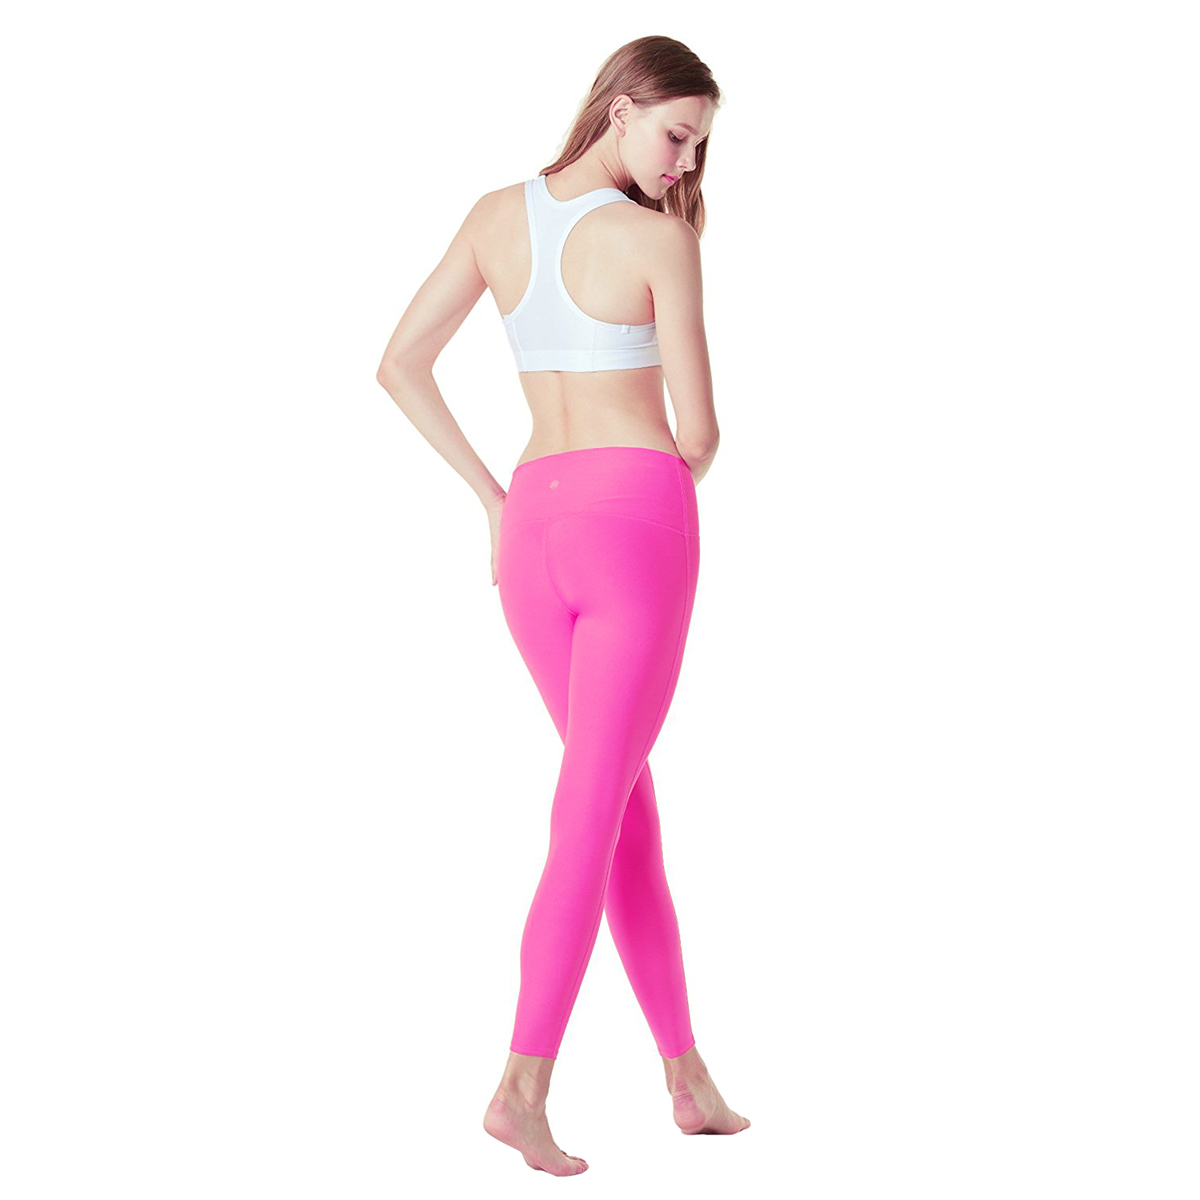 thumbnail 51 - TSLA Tesla FYP42 Women's High-Waisted Ultra-Stretch Tummy Control Yoga Pants